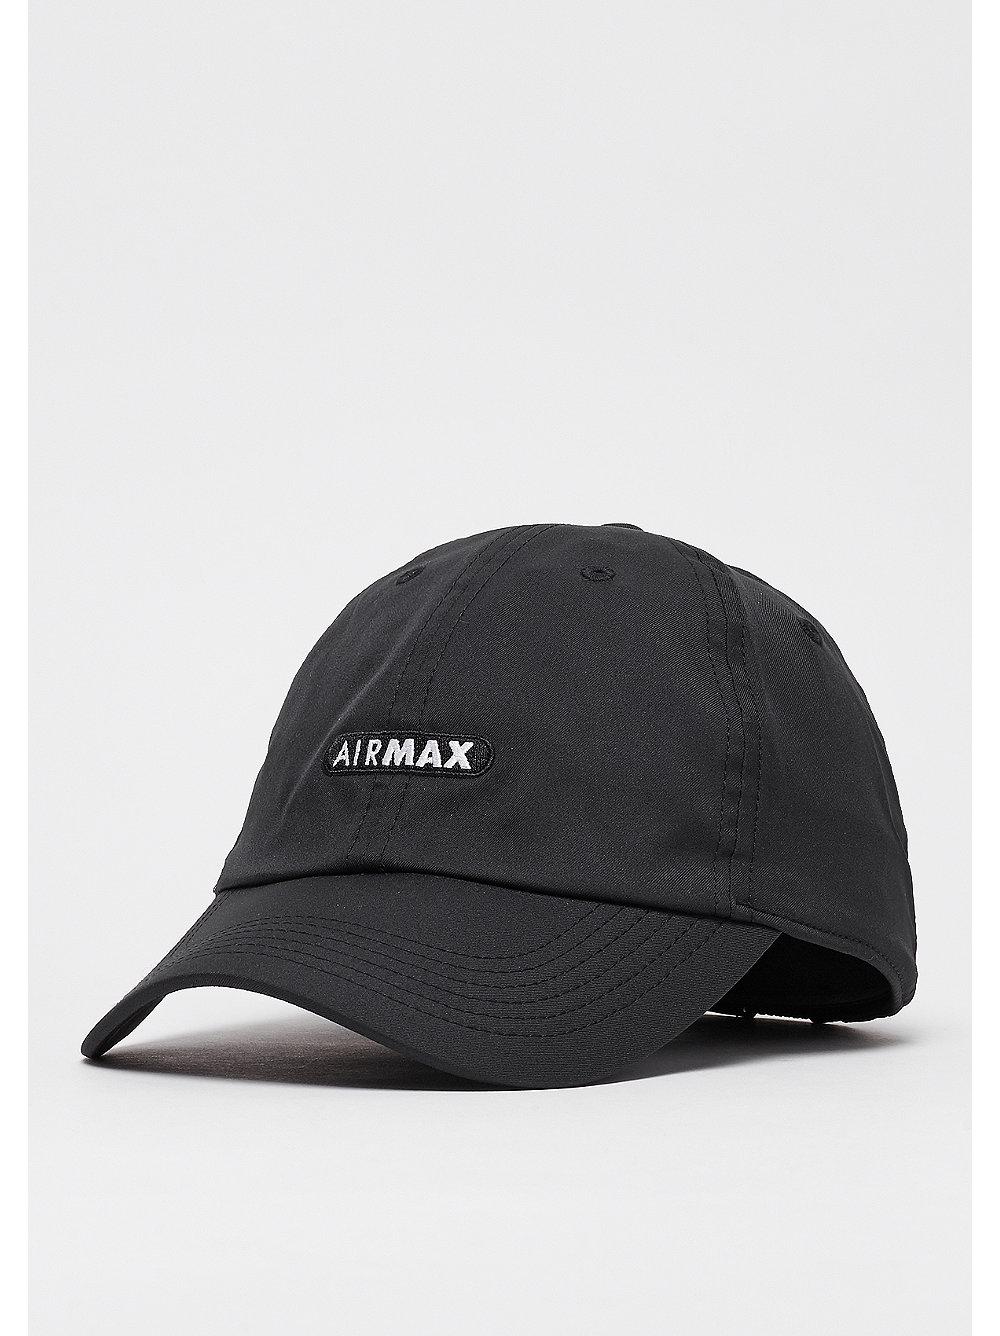 Buy nike air max cap   up to 77% Discounts 6f56c920af9